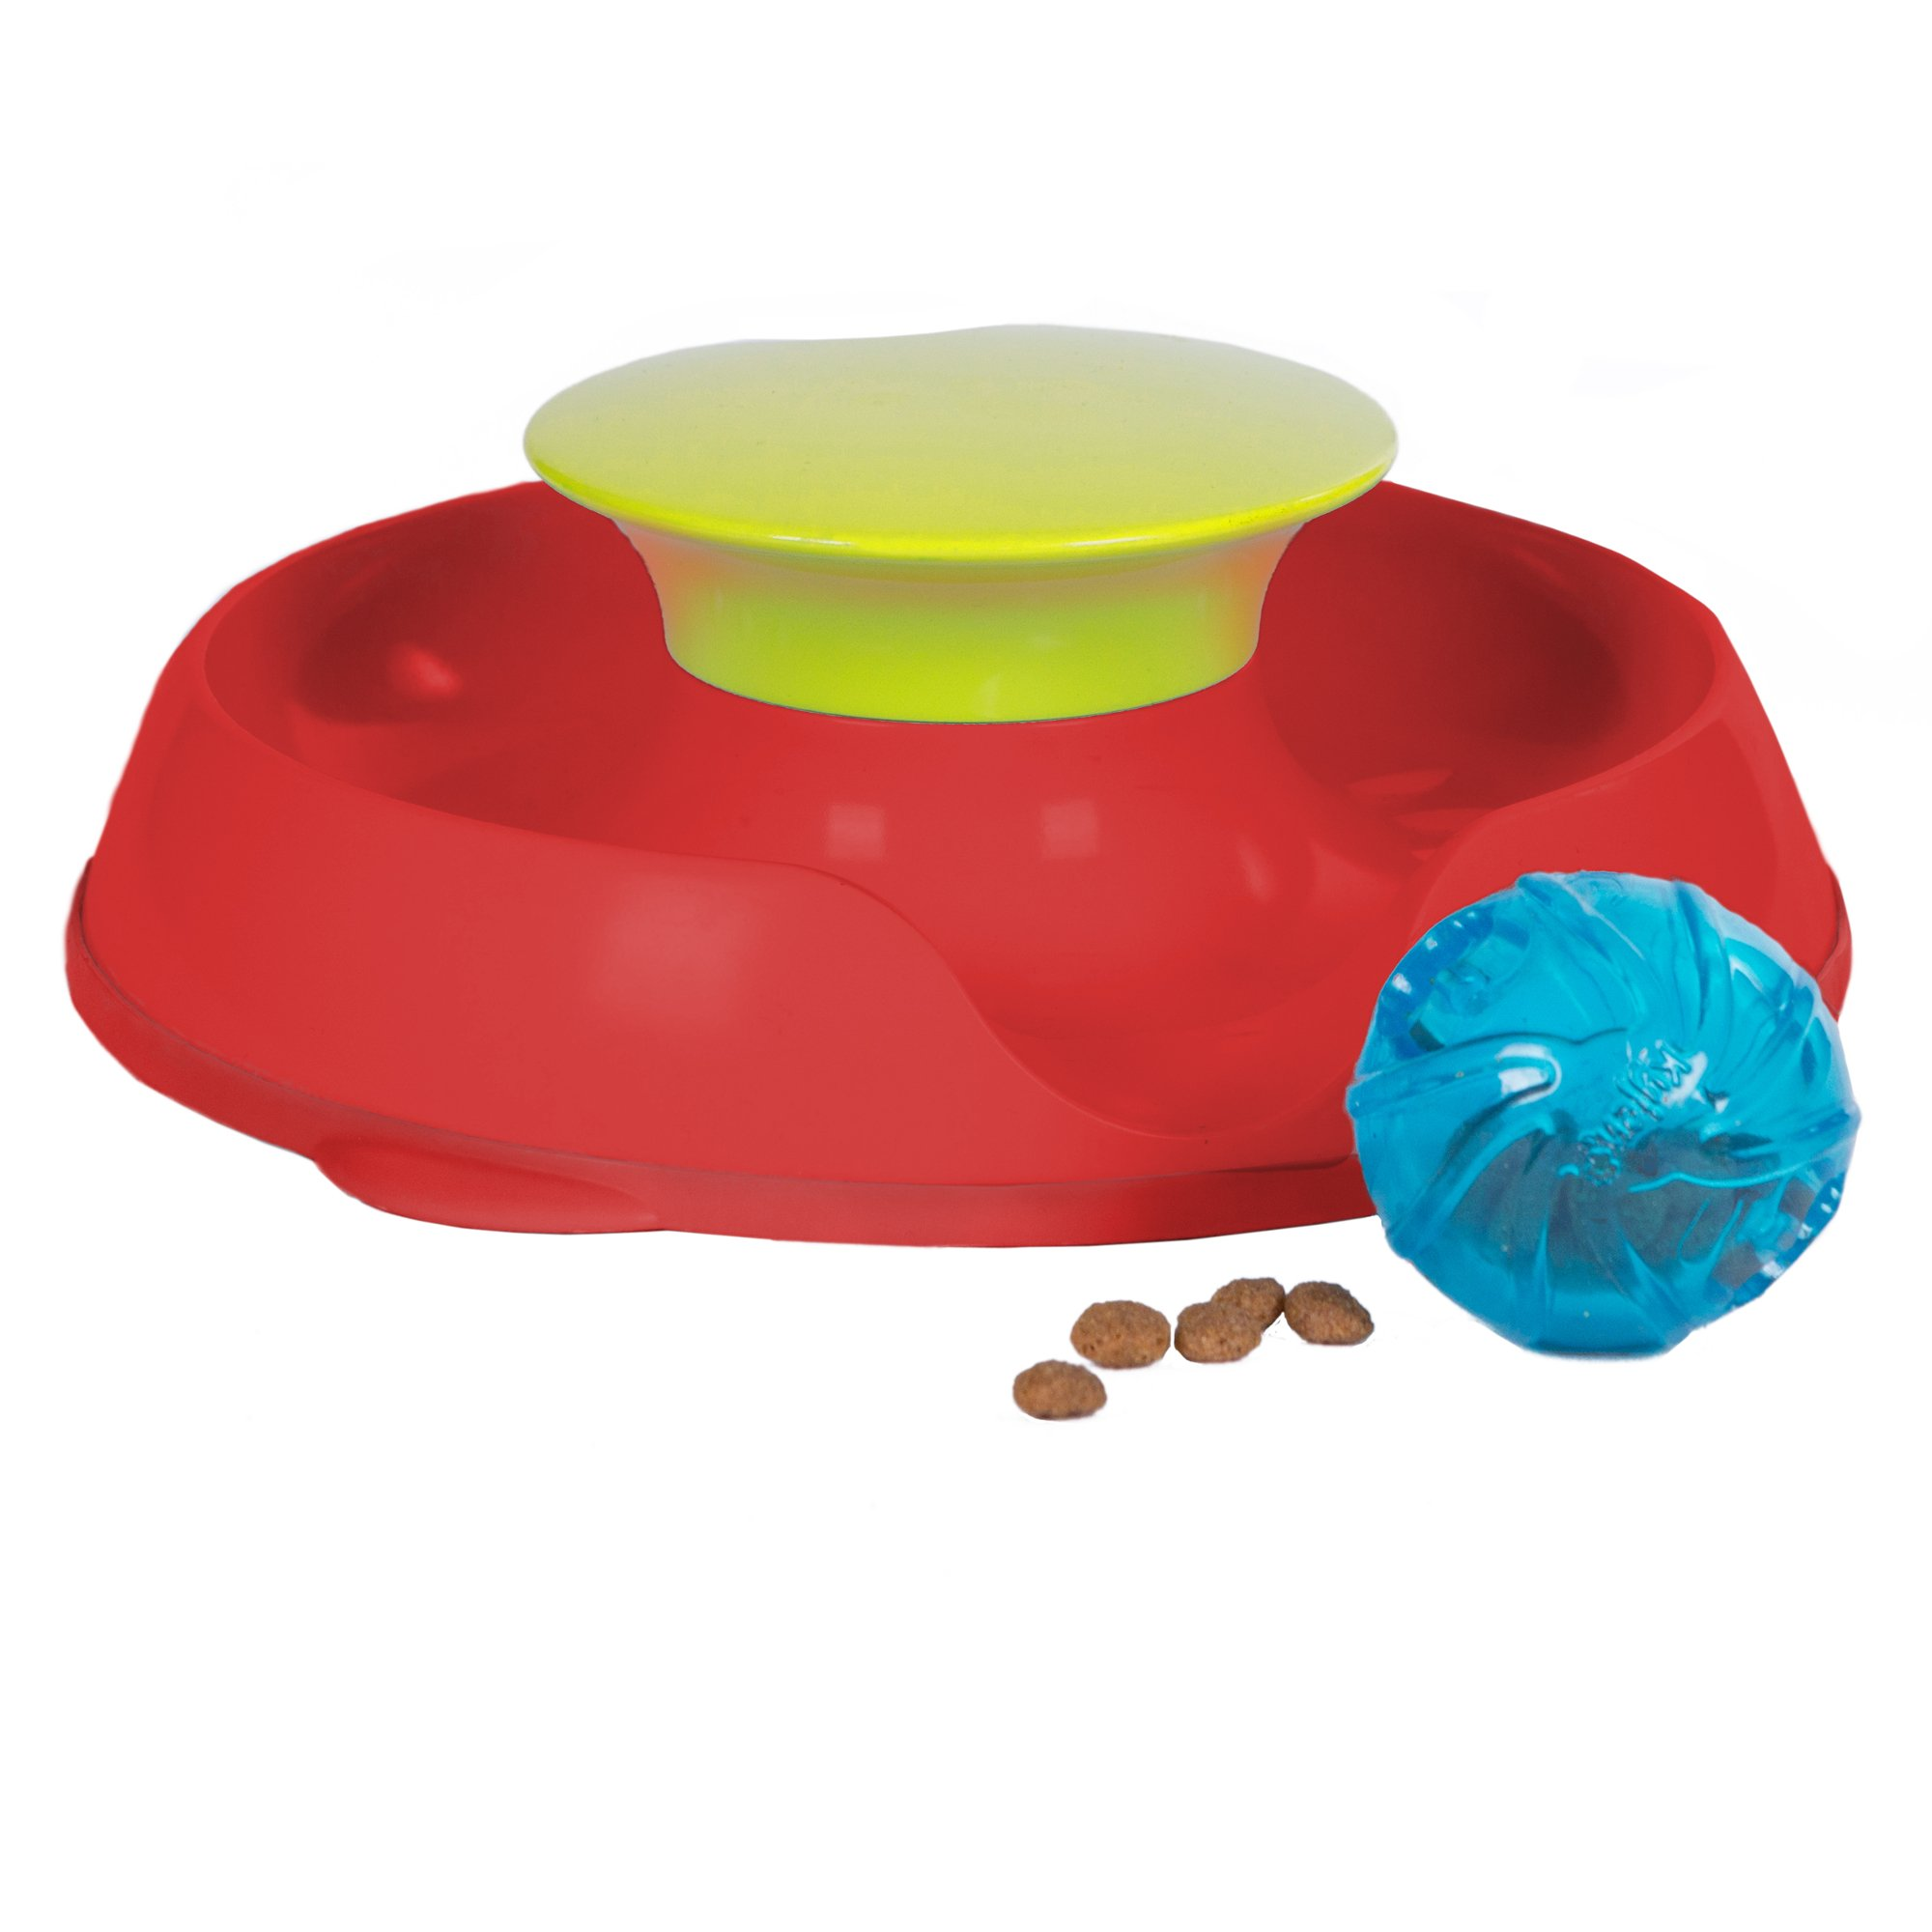 Outward Hound Treat Twister Dog Toy